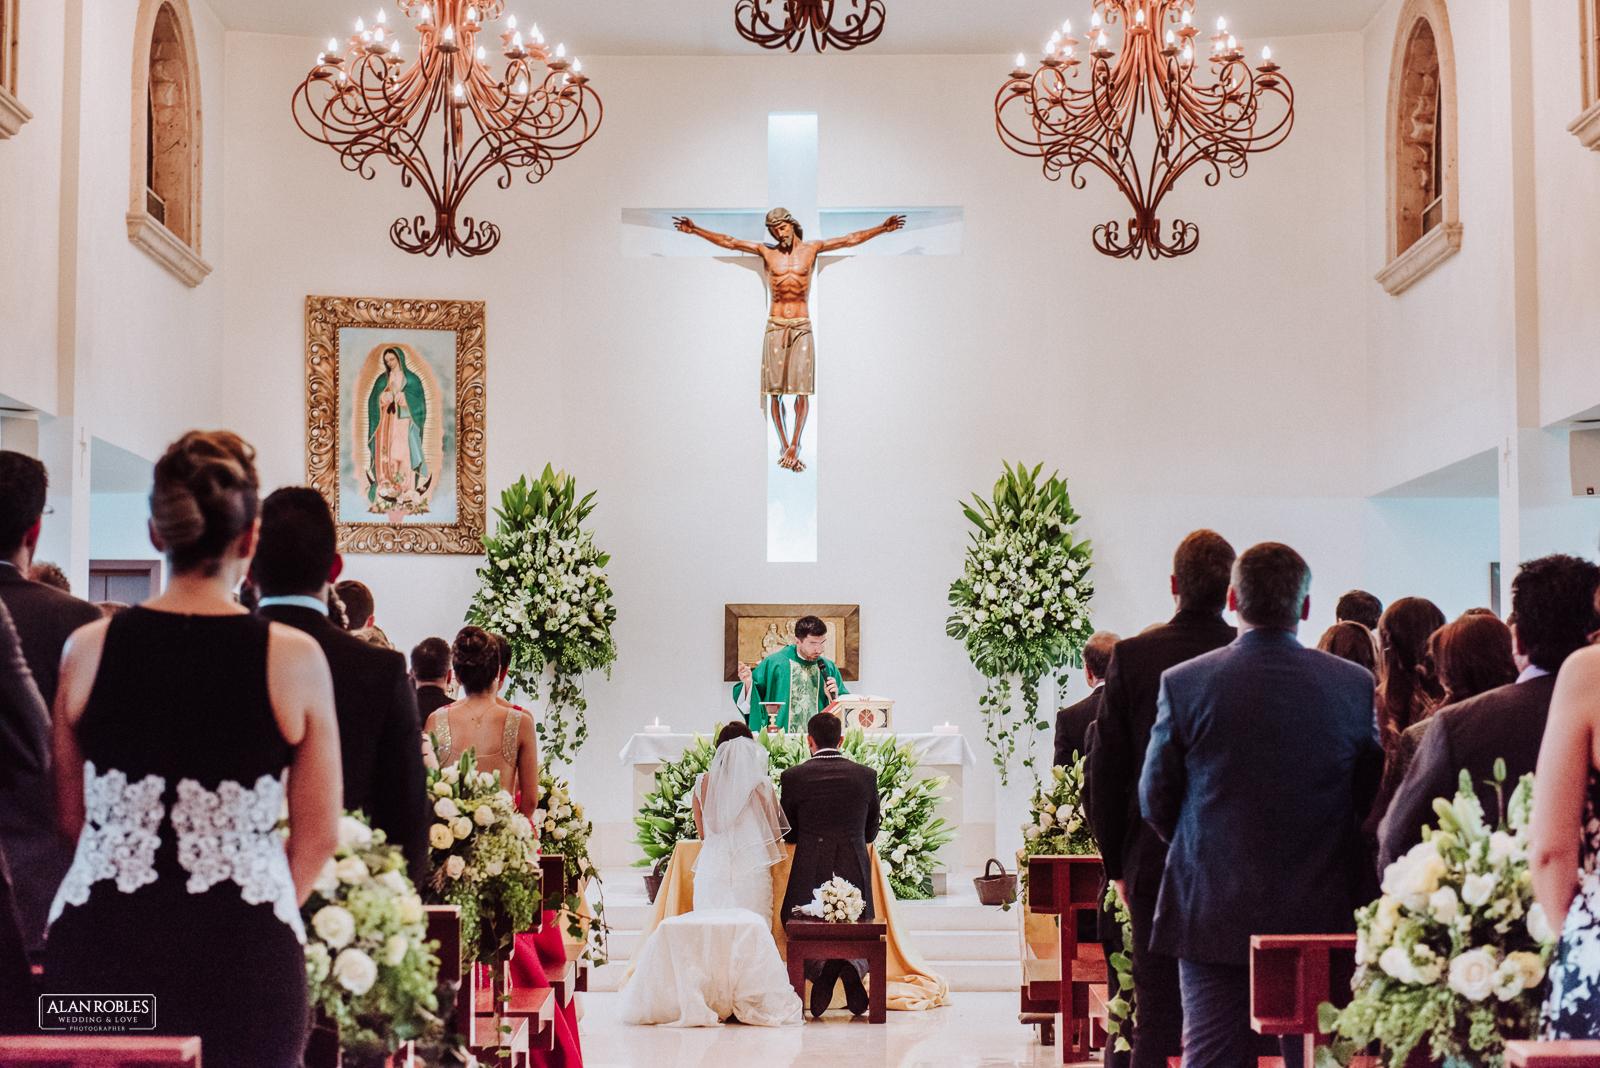 Fotografo de bodas Alan Robles-Boda en Guadalajara Real San Javier-46